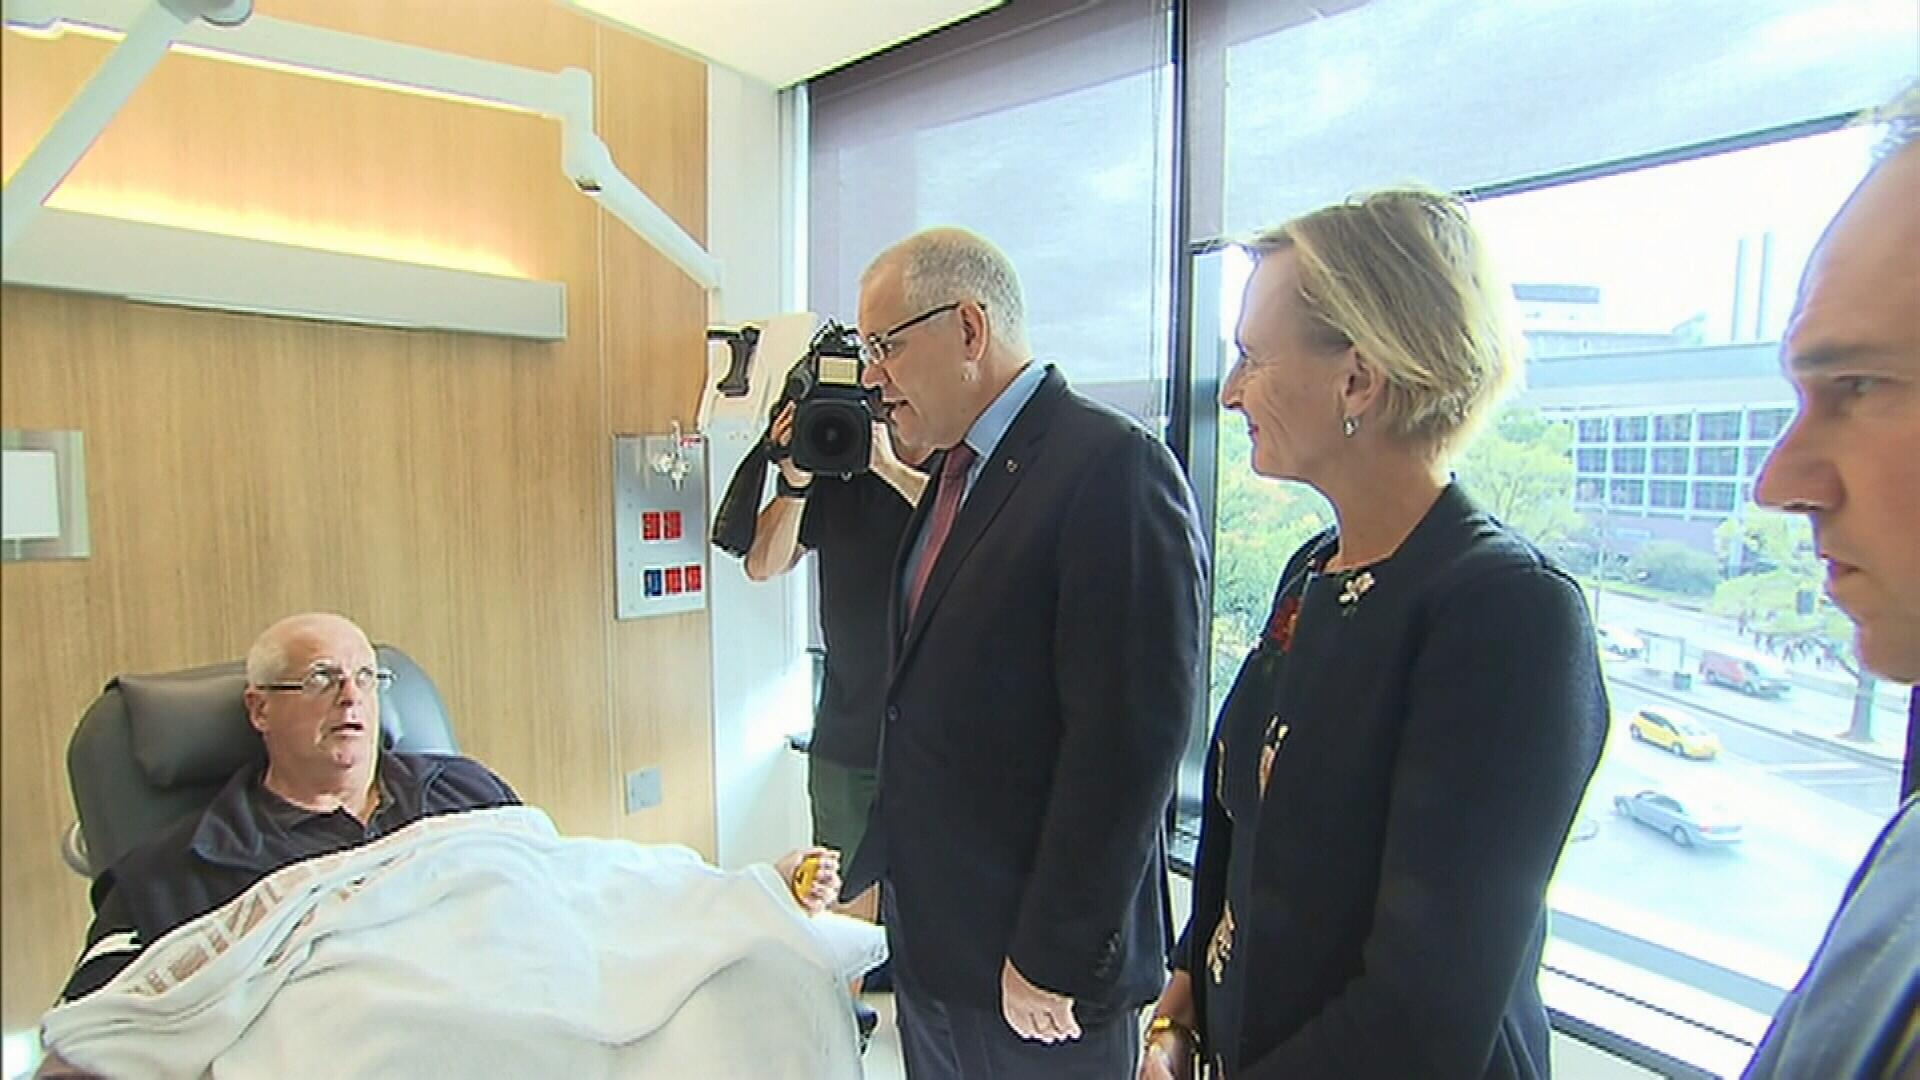 Scott Morrison unveils new 'life-changing' cancer treatment centre in Melbourne